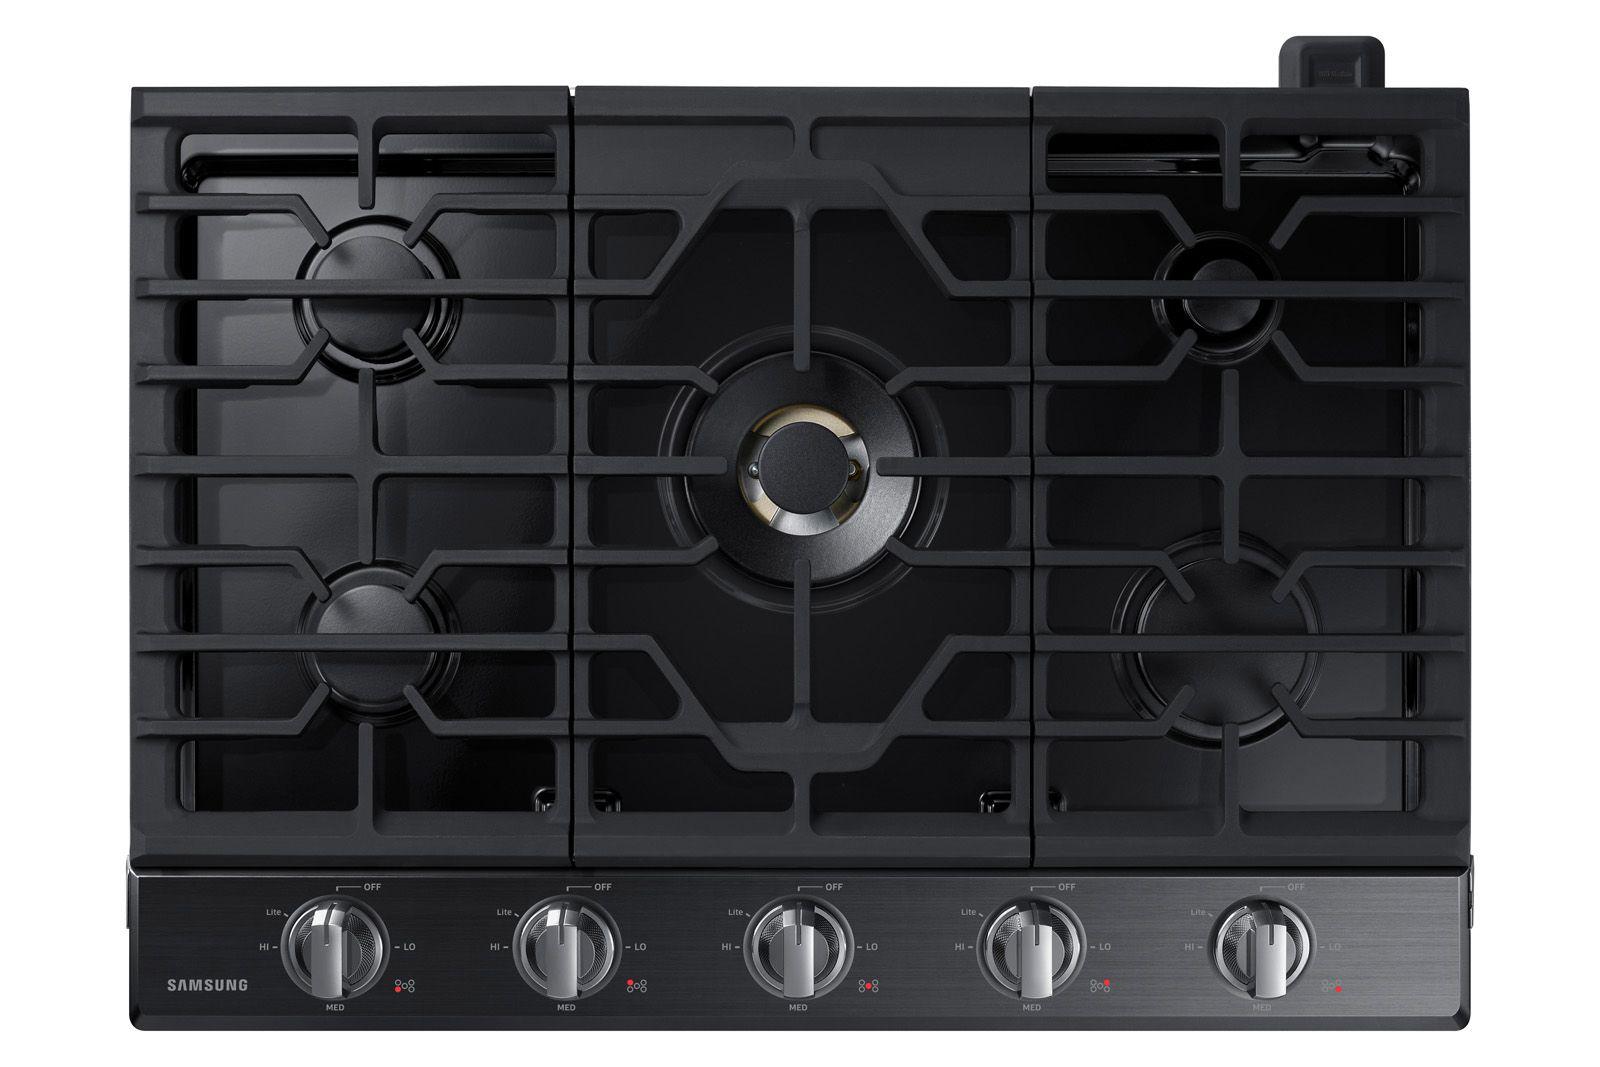 Samsung 30 Gas Cooktop With 22k Btu Dual Power Burner In Black Stainless Steel Kitchen Island Decor Black Stainless Steel Modern Kitchen Island